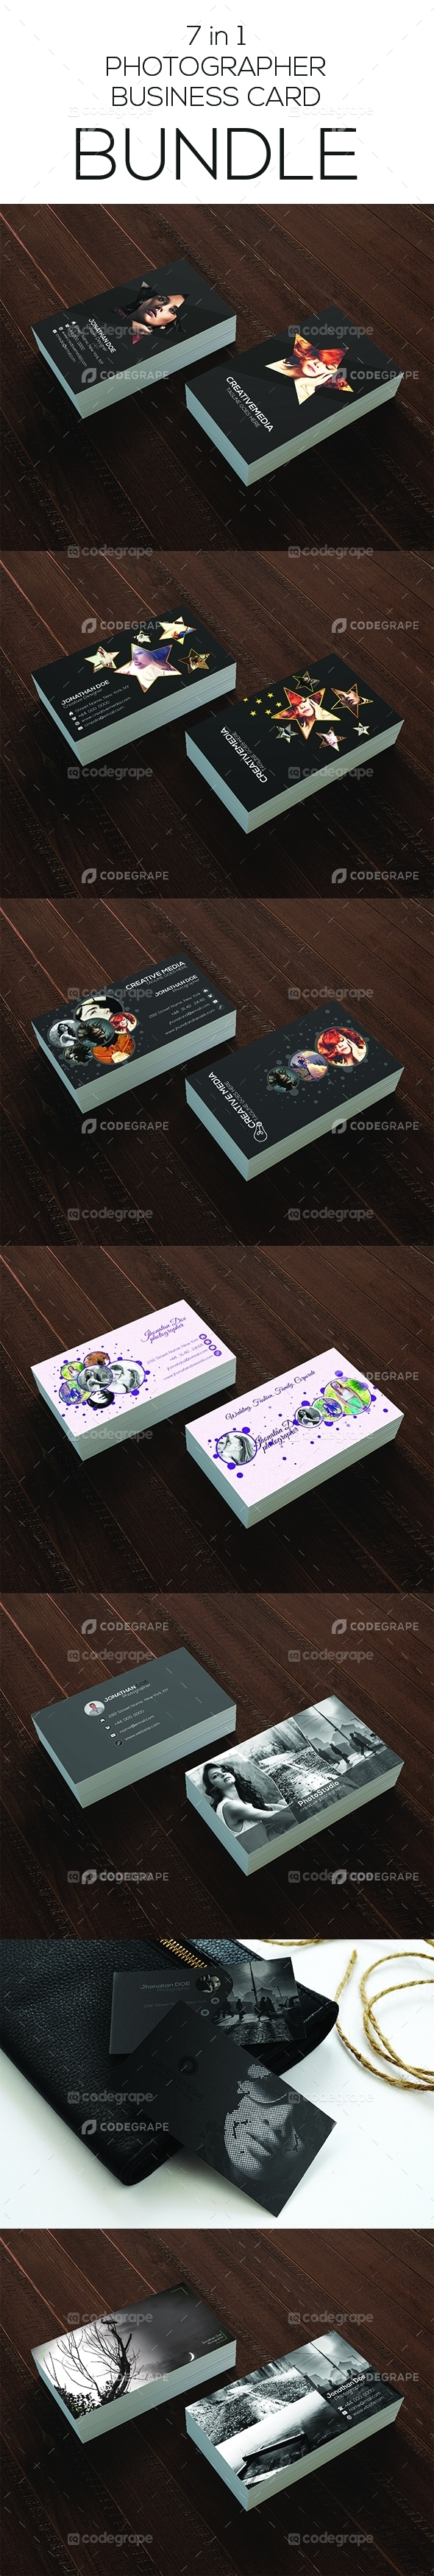 7 in 1 Photographer Business Card Bundle